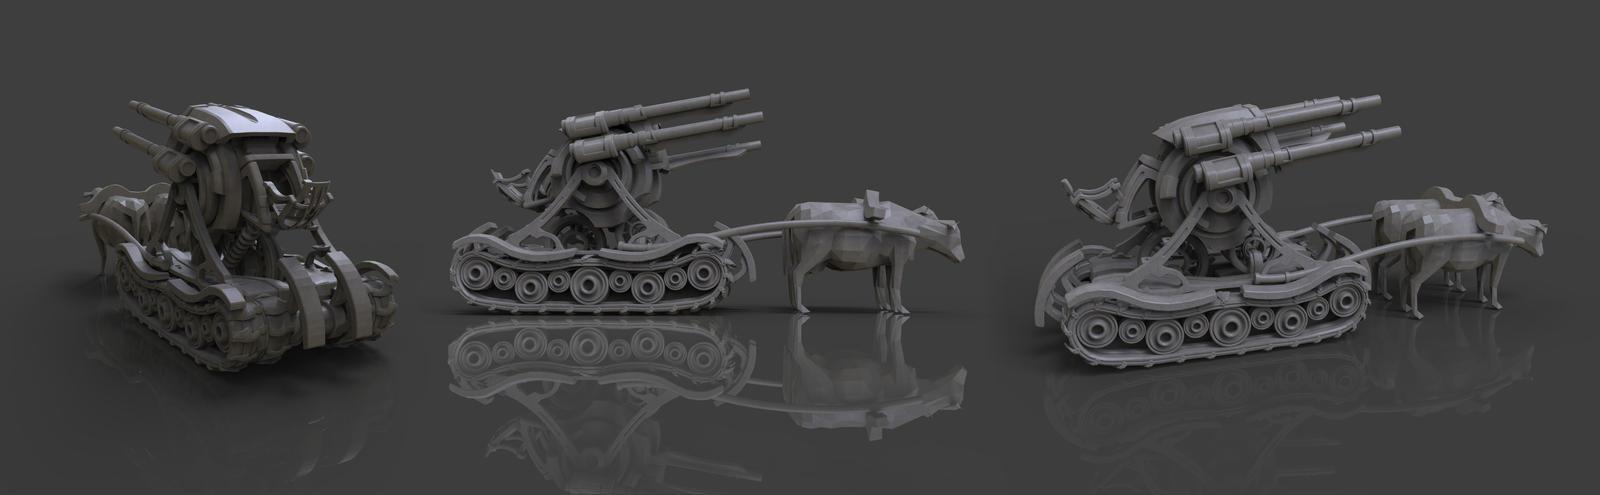 ArtilleryWIP by GirlsandBots